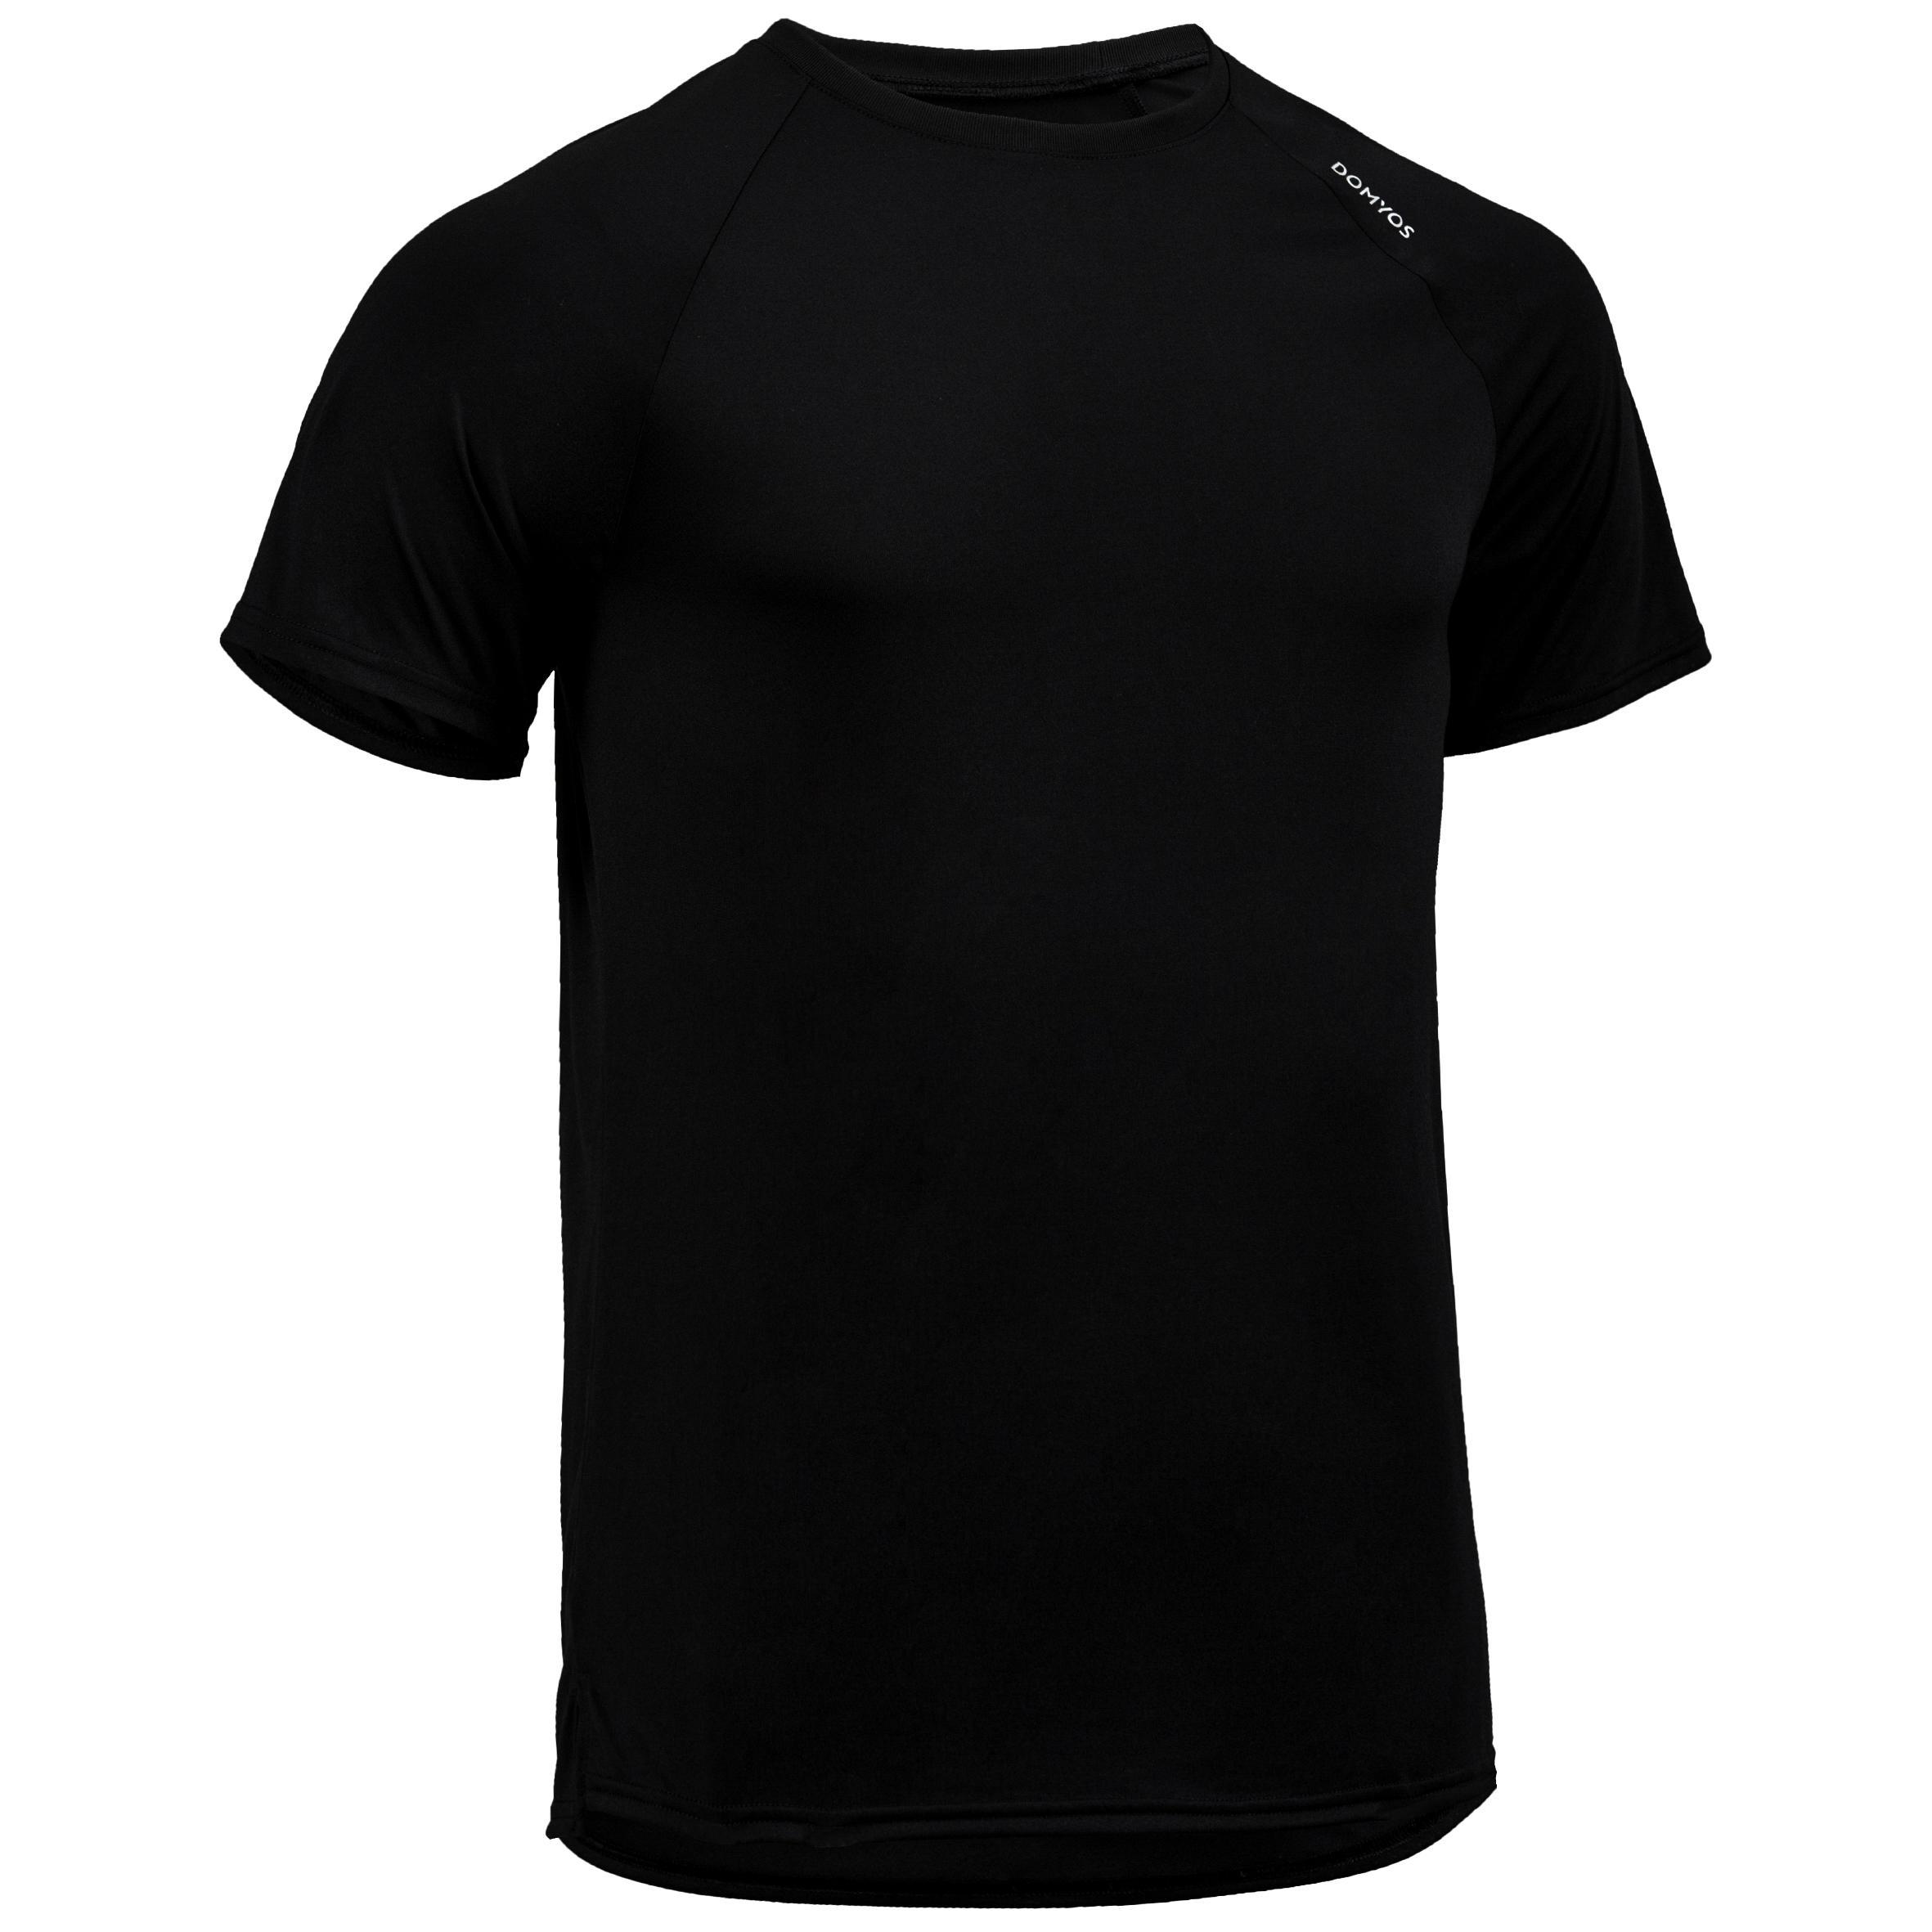 FTS 100 Cardio Fitness T-Shirt - Black